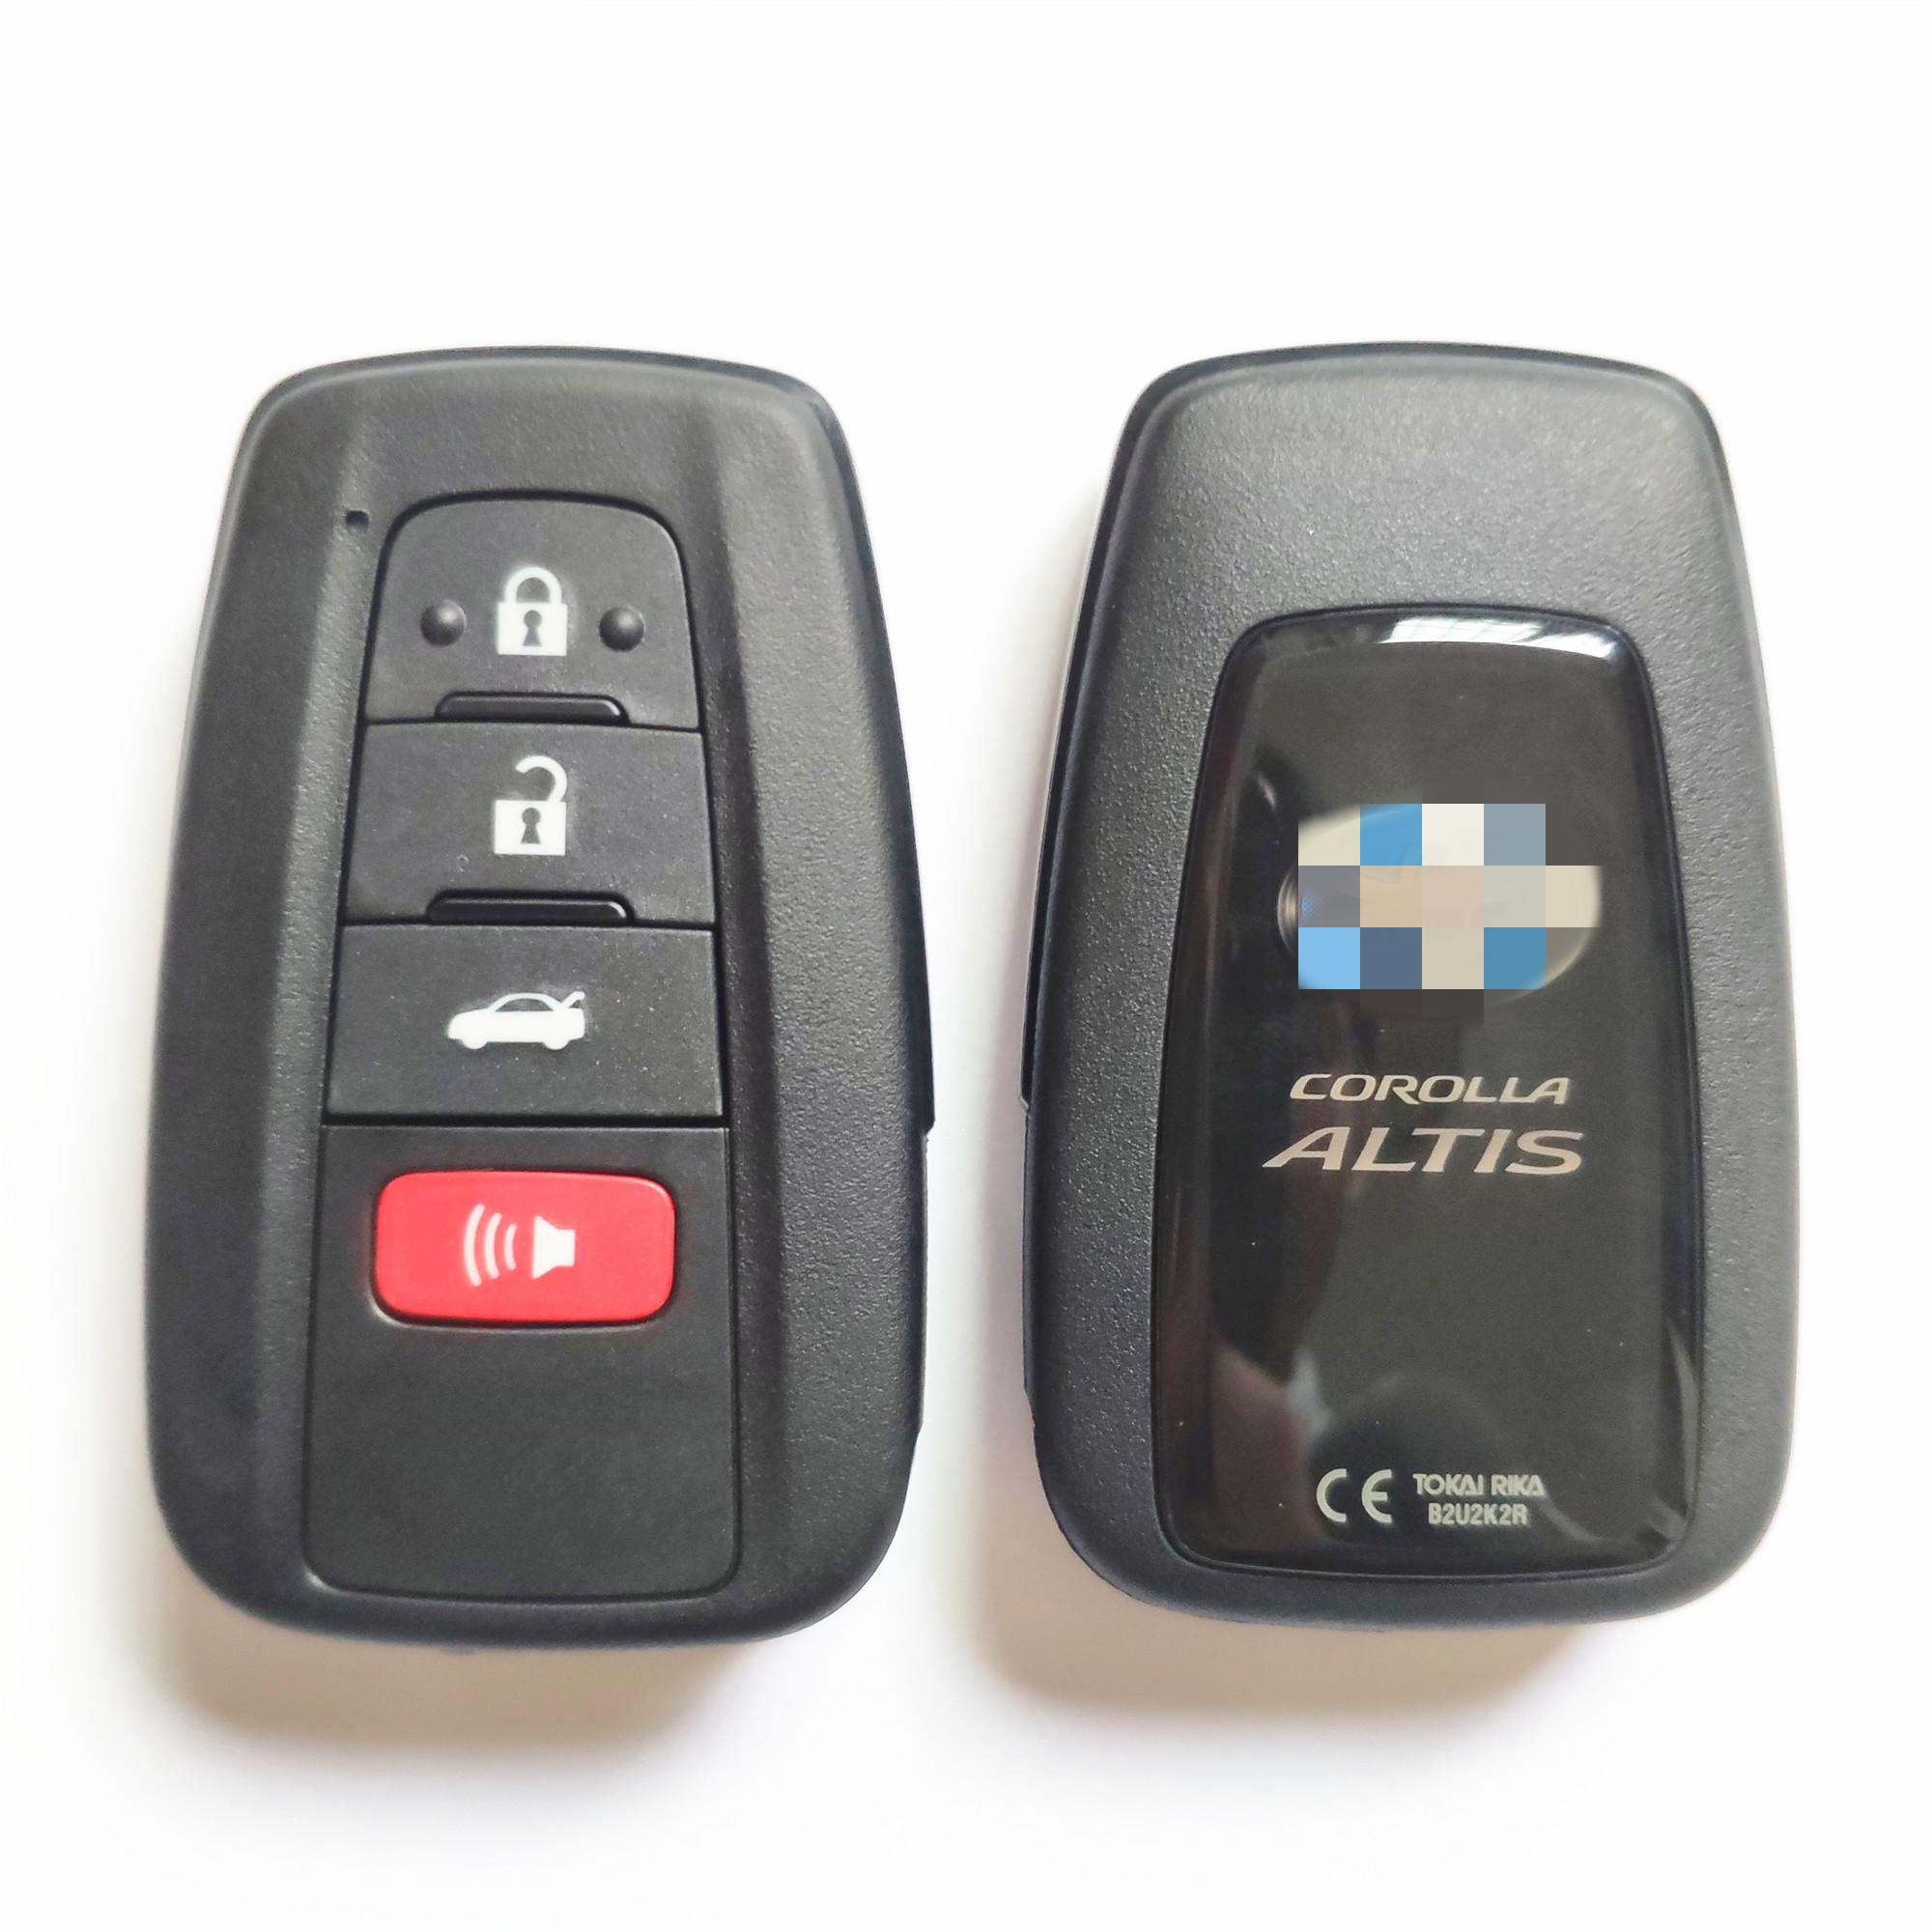 Original 3+1 Buttons 434 MHz Smart Key for Toyota Corolla Altis - TOKAI RIKA B2U2K2R - 61E466-0010